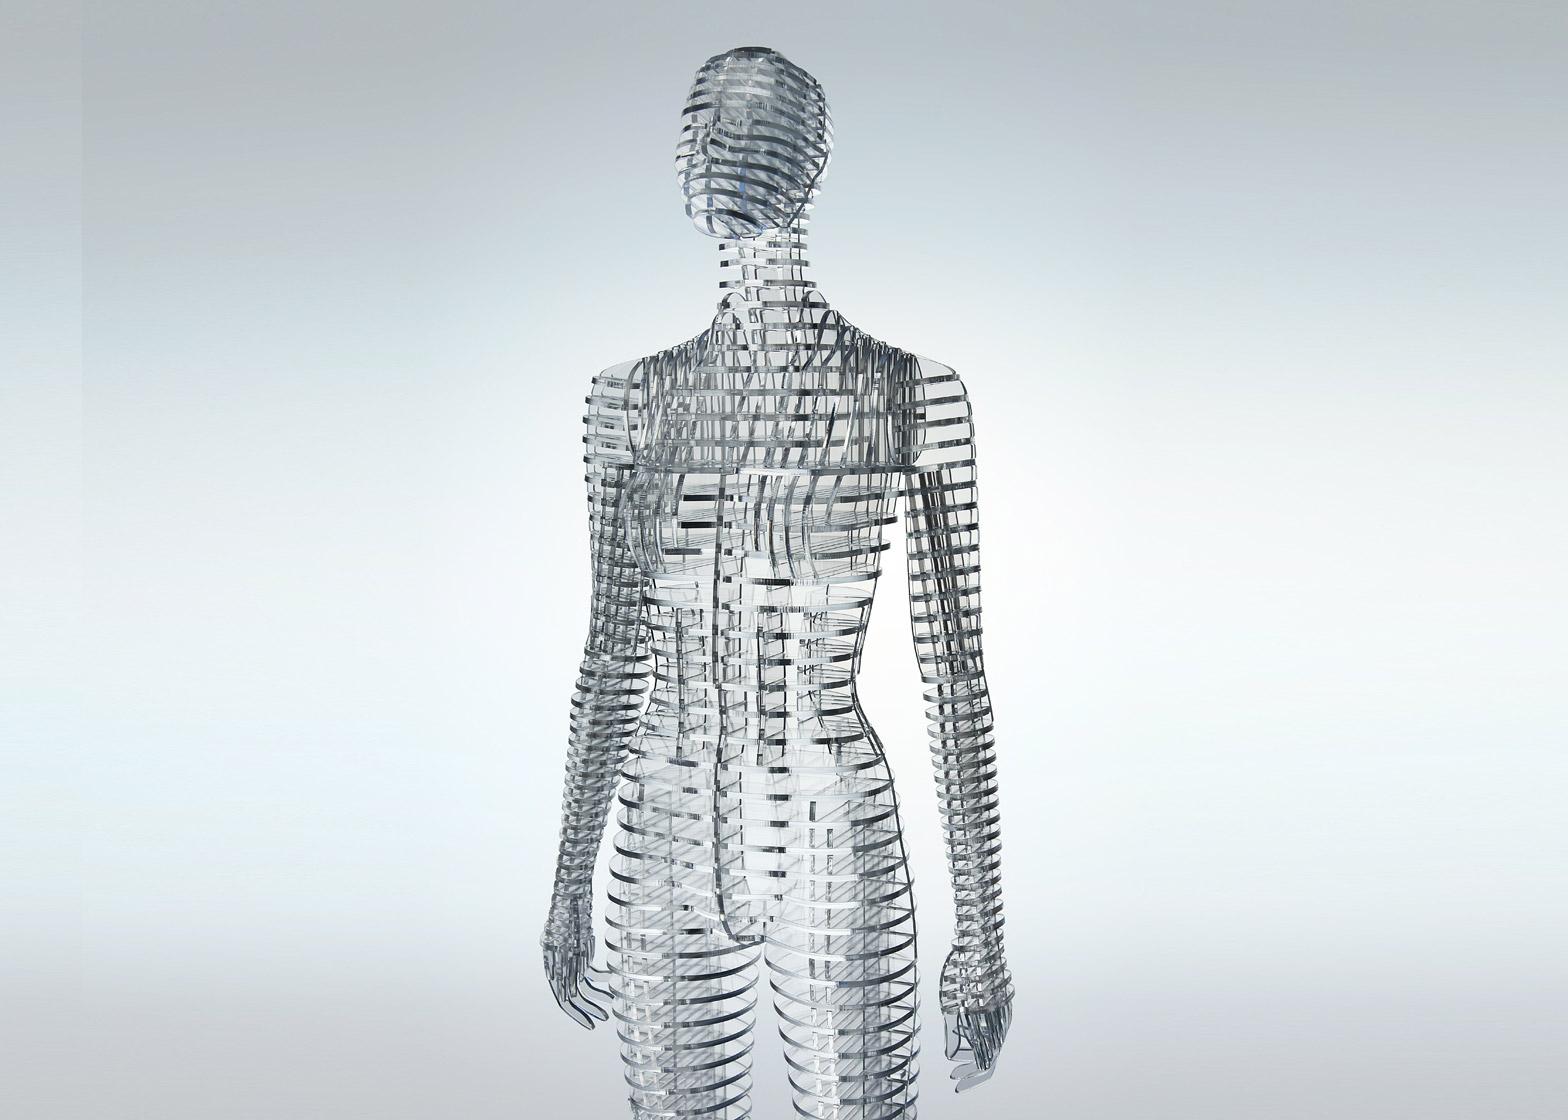 transparent-body-installation-tokujin-yoshioka-issey-miyake-exhibition-tokyp-japan_dezeen_1568_2.jpg